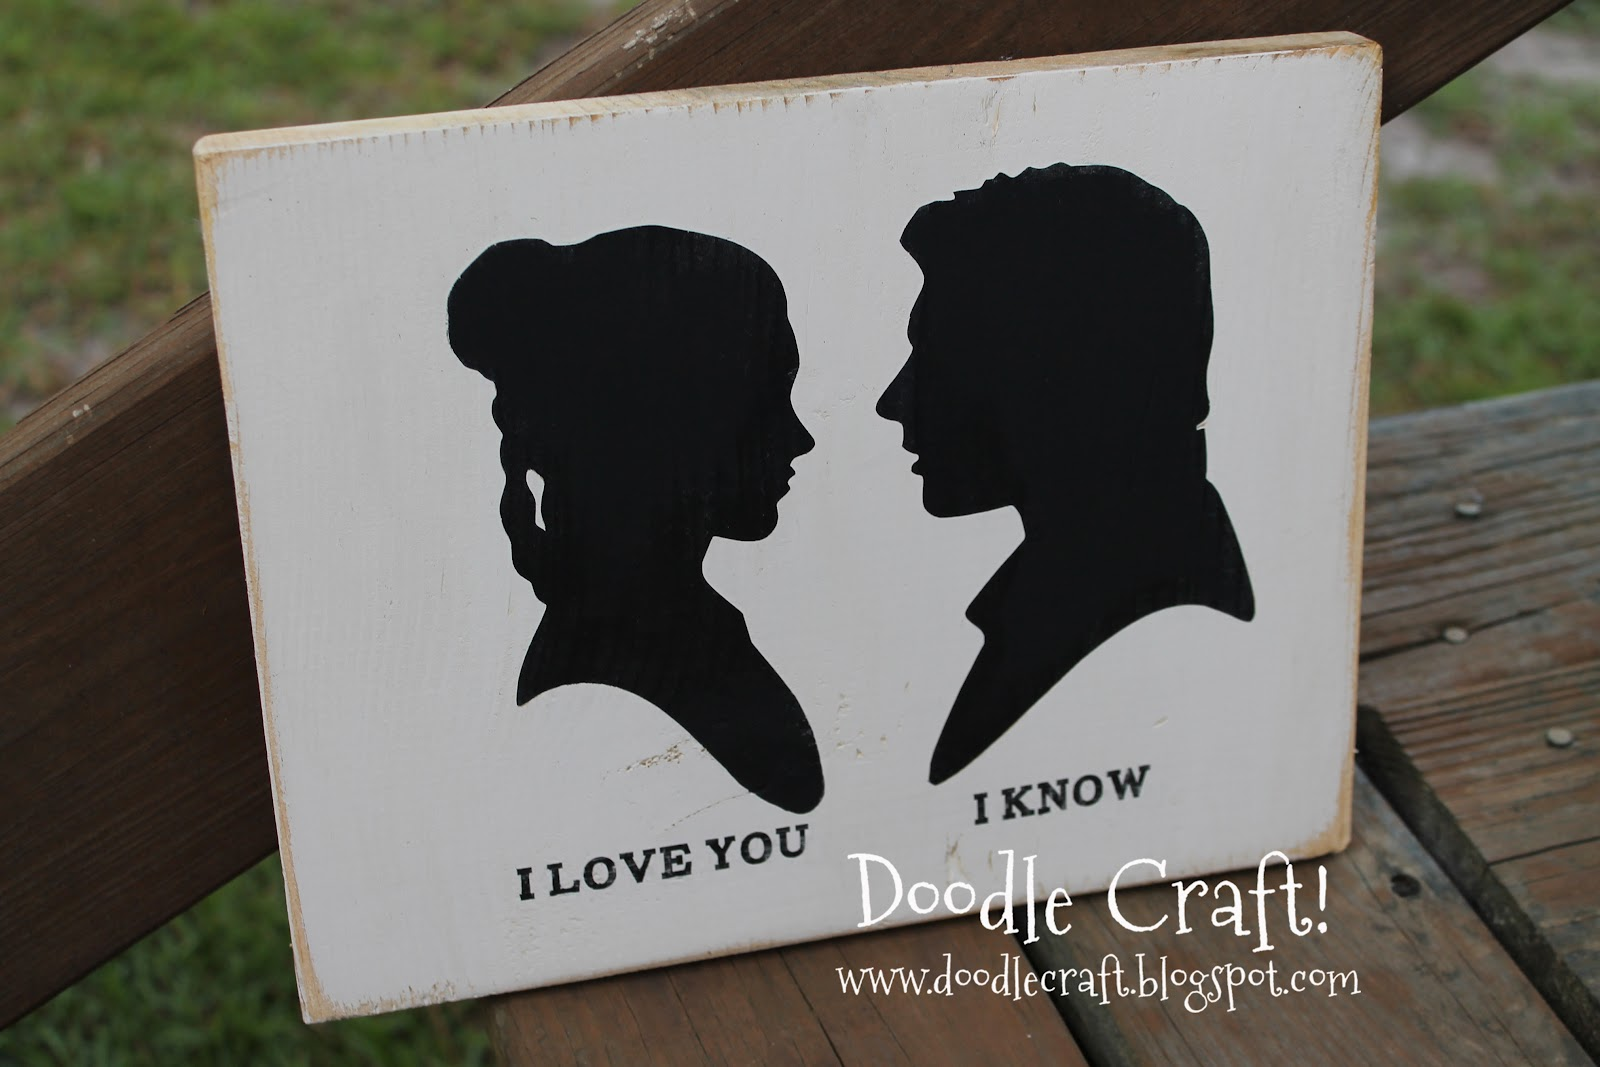 I Love You I Know Star Wars Watercolor Print Geek Art Han Solo /& Princess Leia